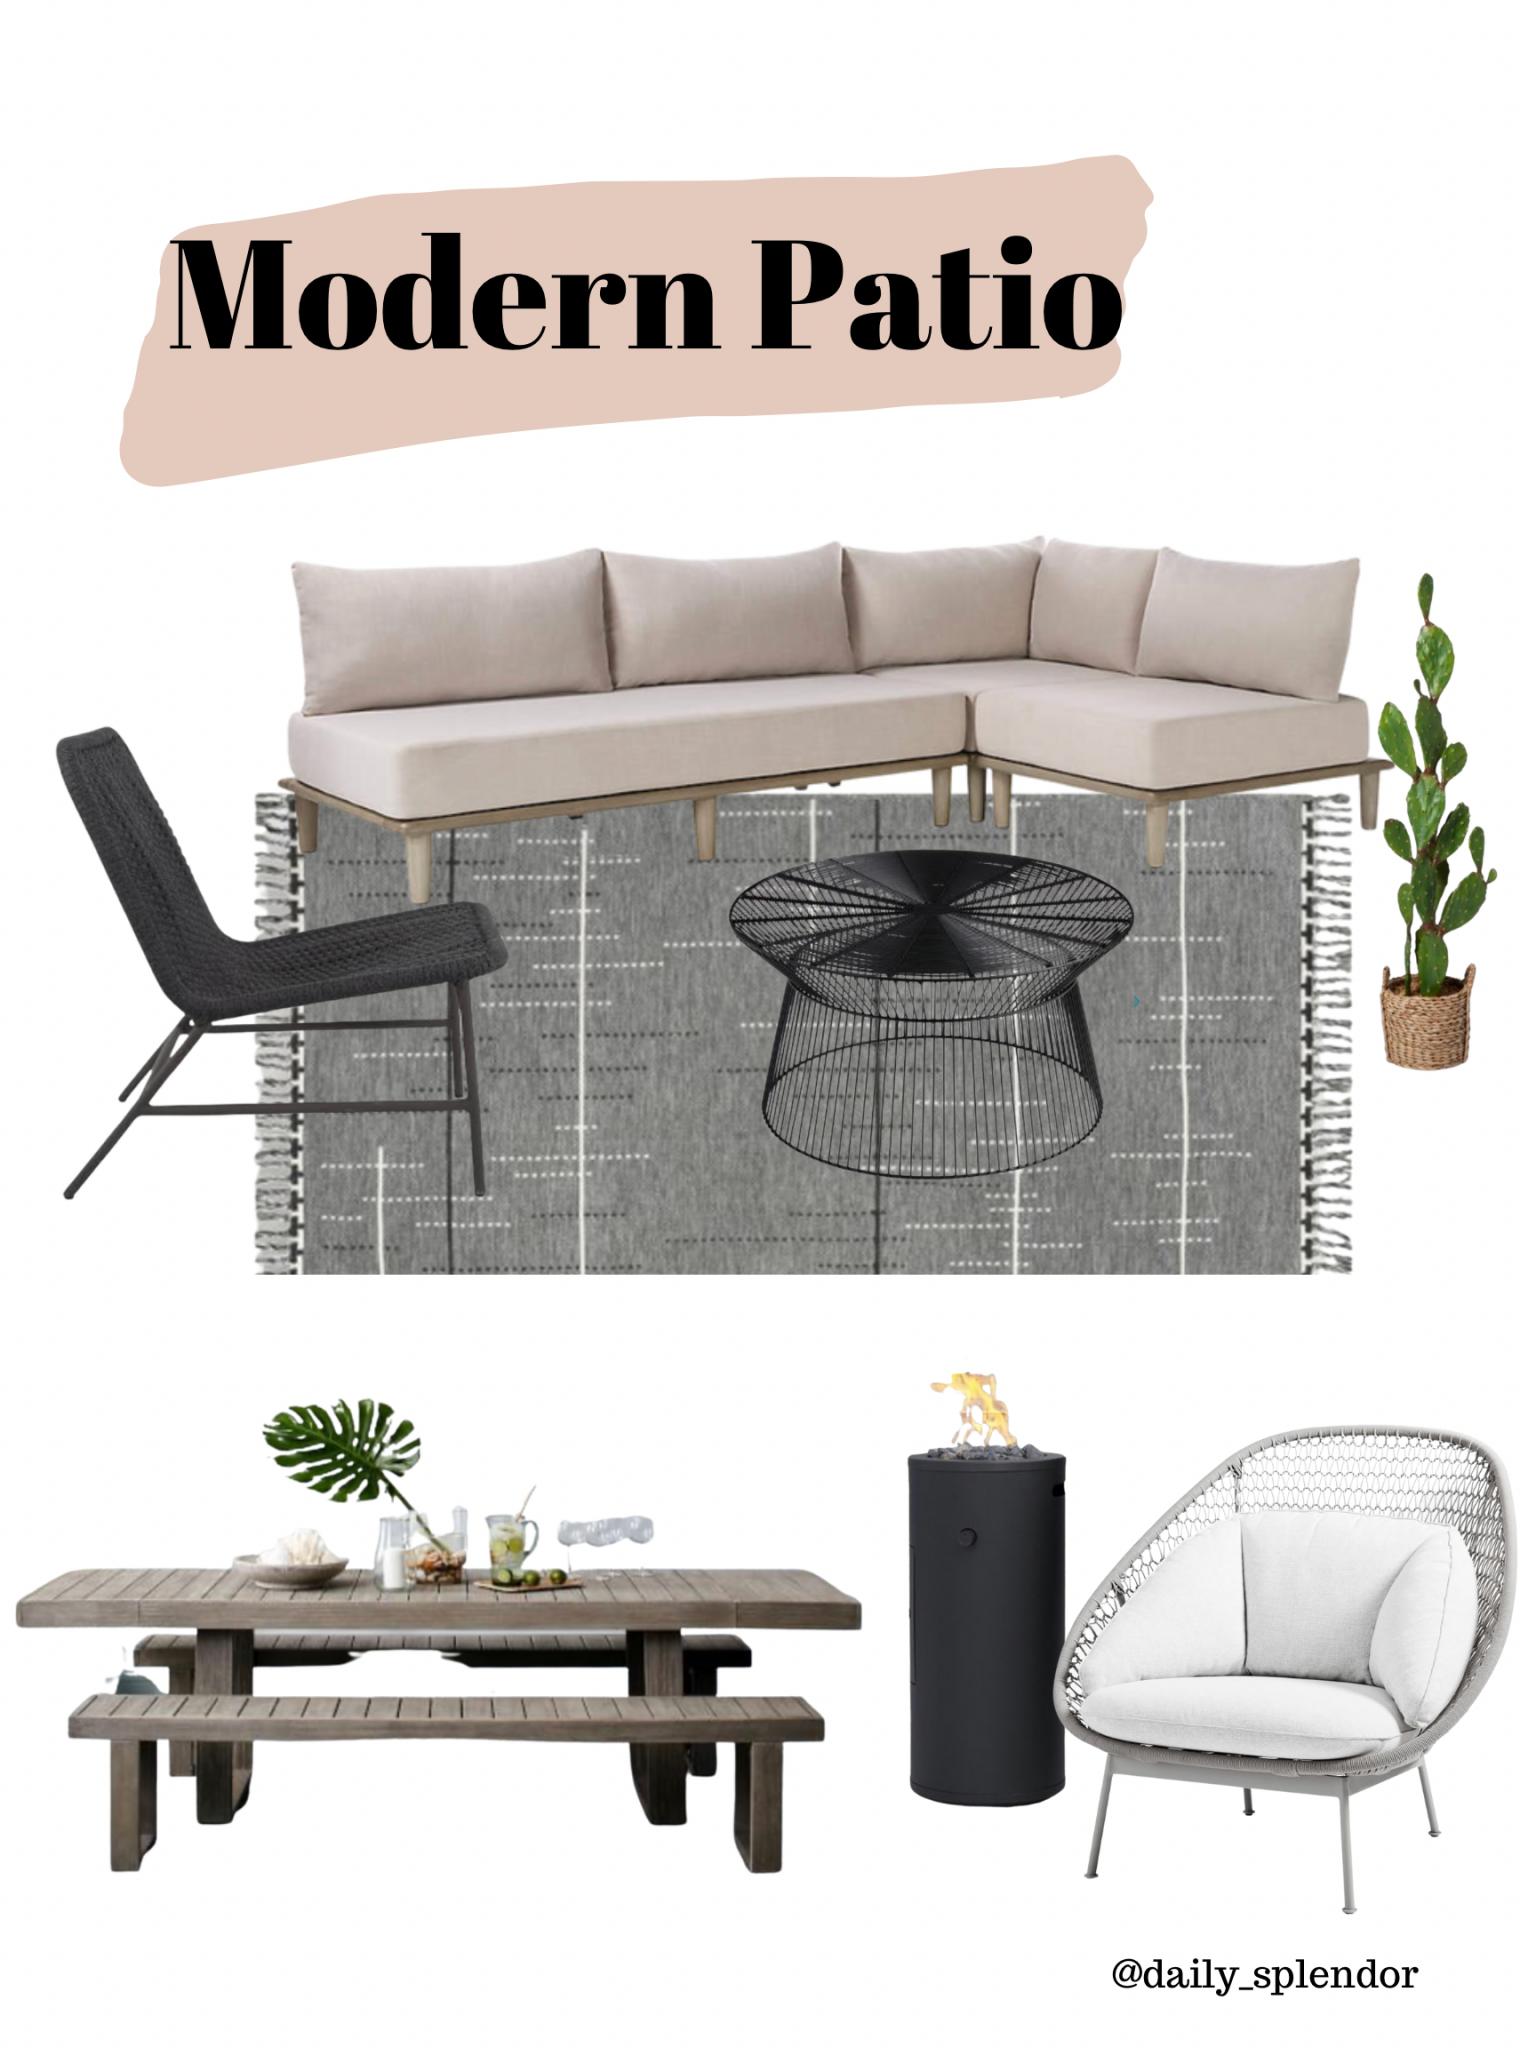 Patio refresh ideas | Daily Splendor Life and Style Blog | Modern patio vibe #outdoorfurniture #outdoorliving #summertime #patiodecor #patiofurniture #westelm #crateandbarrel #moderndesign #transitionaldesign #neutraldesign